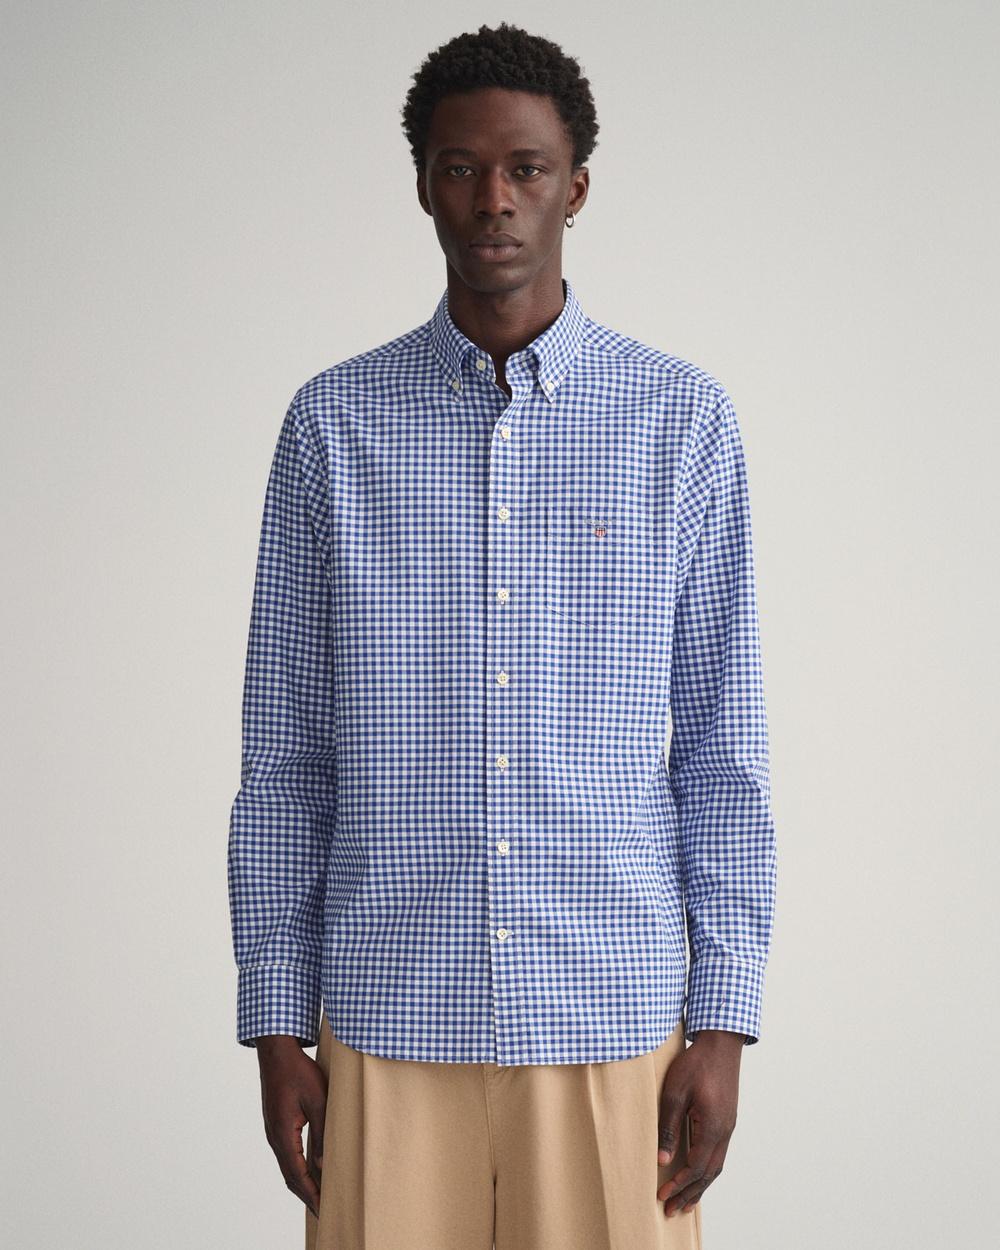 Gant Broadcloth Gingham Shirt Shirts & Polos COLLEGE BLUE Australia